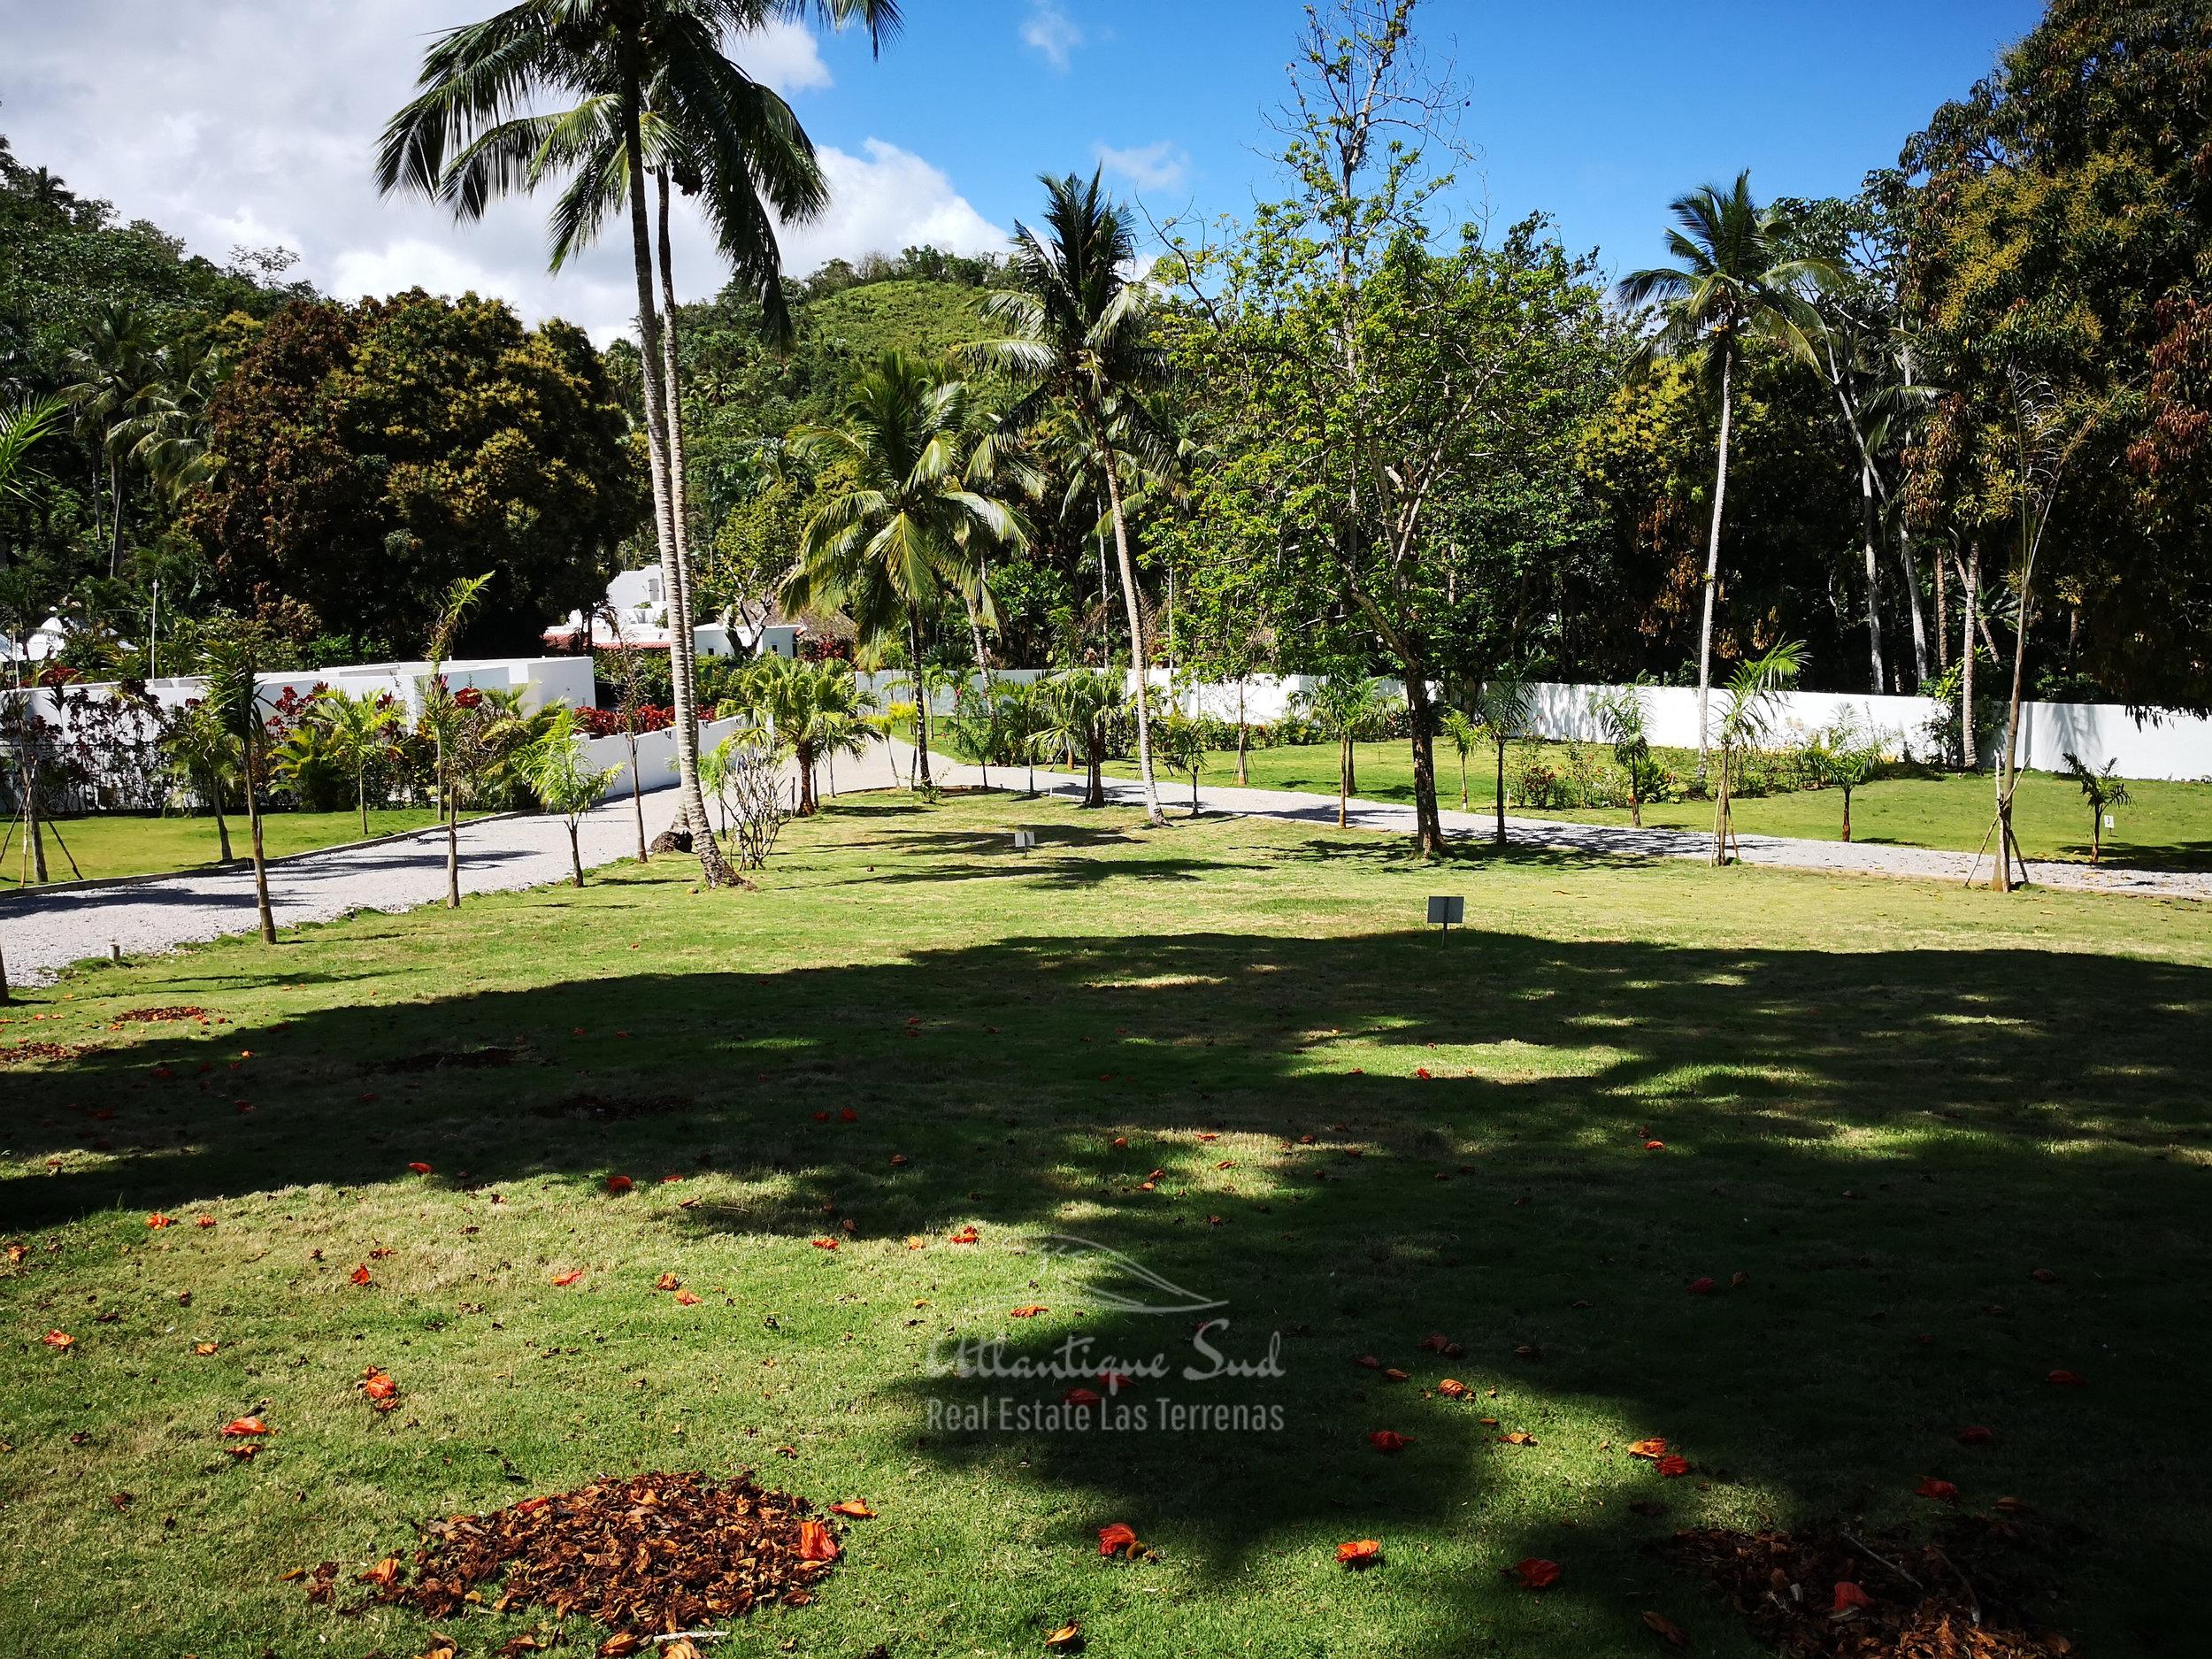 Ready to build lands for sale in Las Terrenas Real Estate Dominican Republic1.jpg